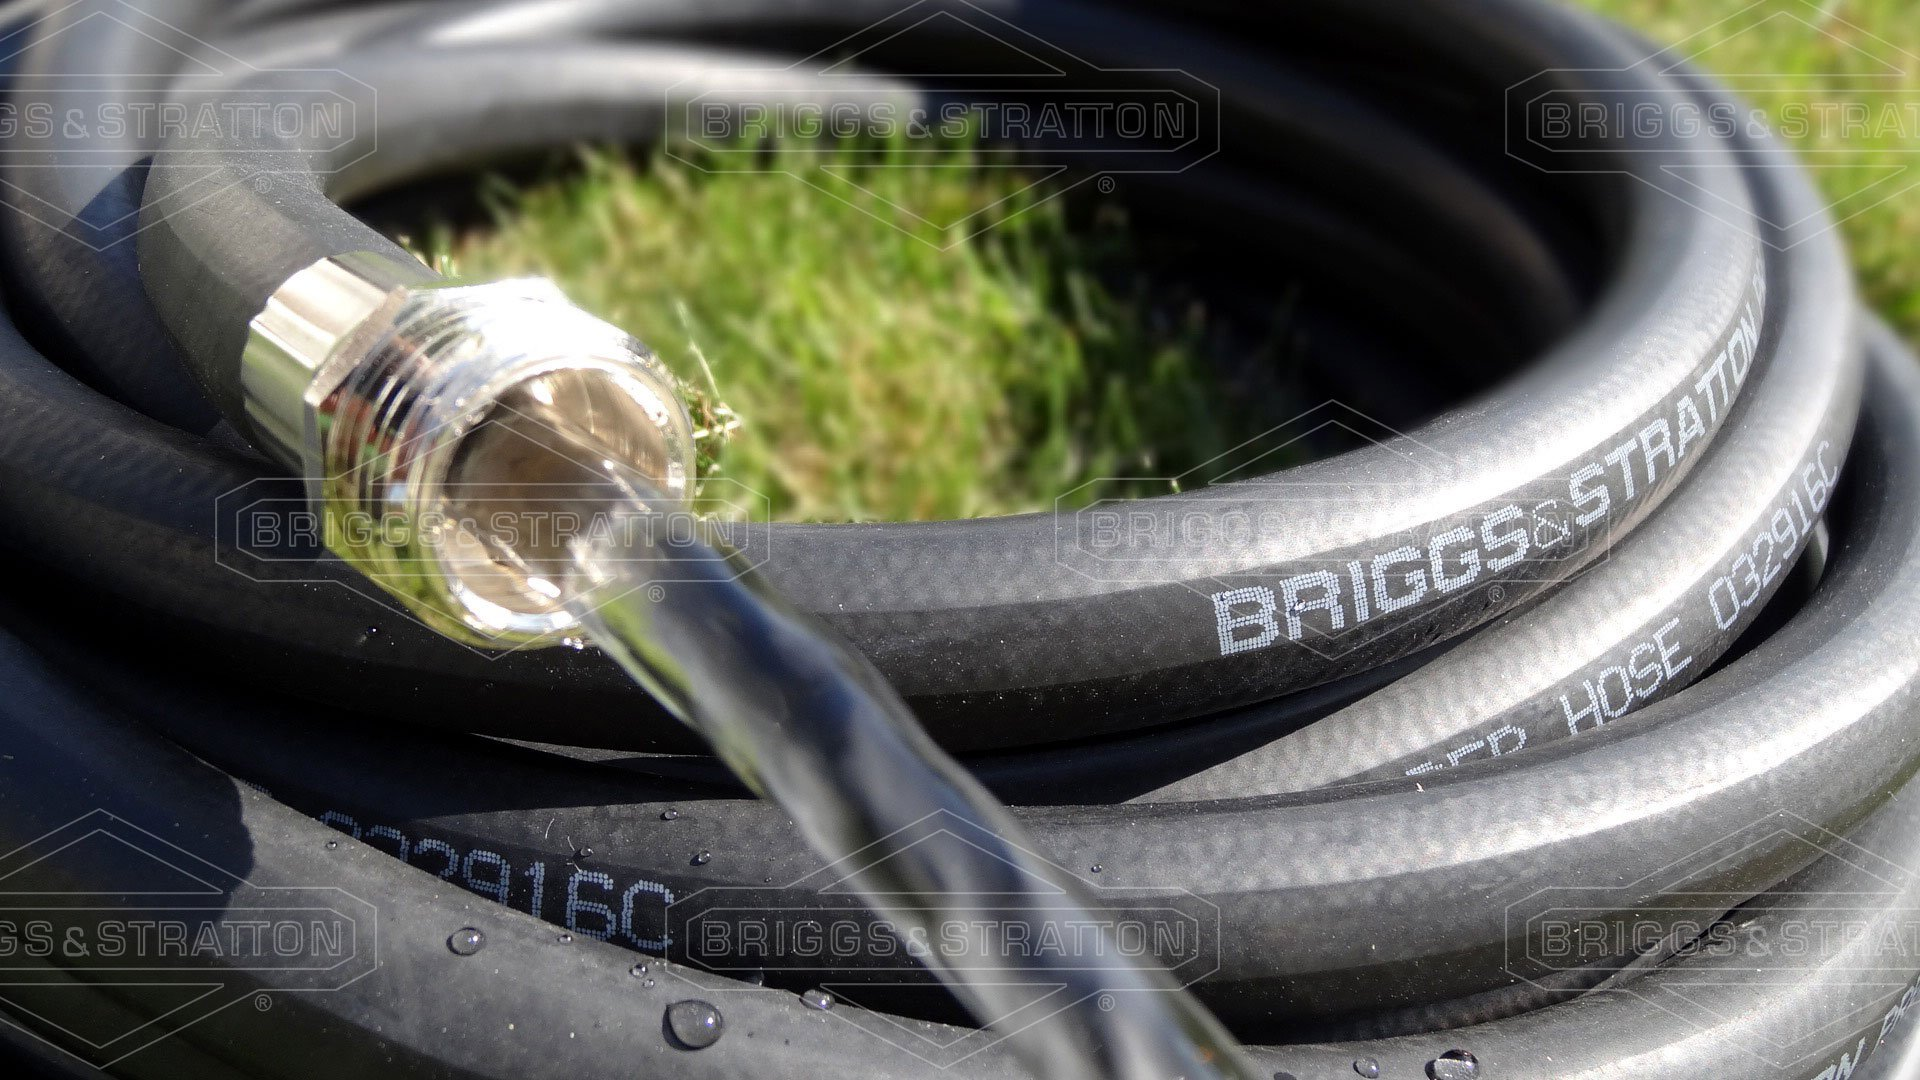 Briggs and Stratton 8BS75 75-Foot Premium Heavy-Duty Rubber Garden Hose by Briggs & Stratton (Image #2)